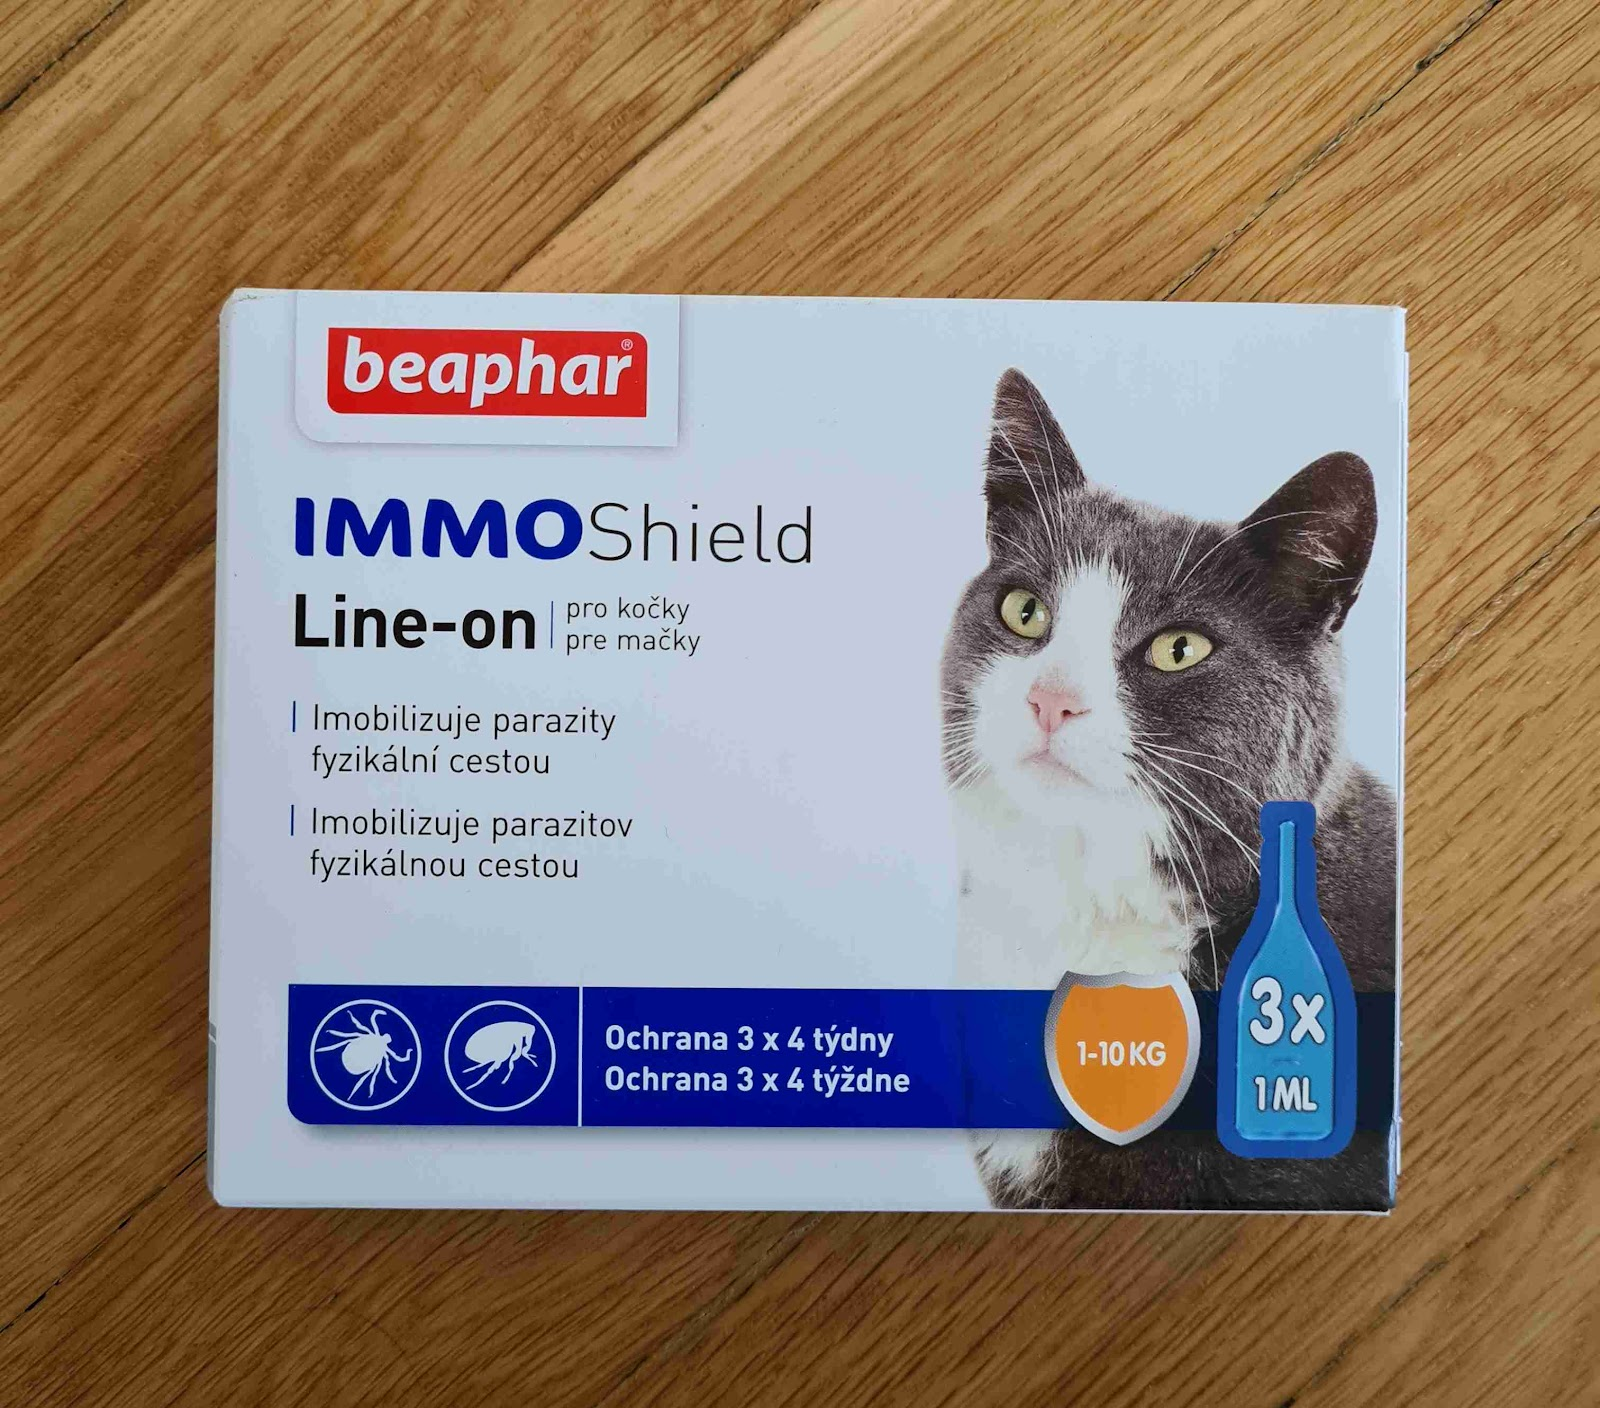 Recenze Superzoo.cz: IMMO Shield Line-on antiparazitikum